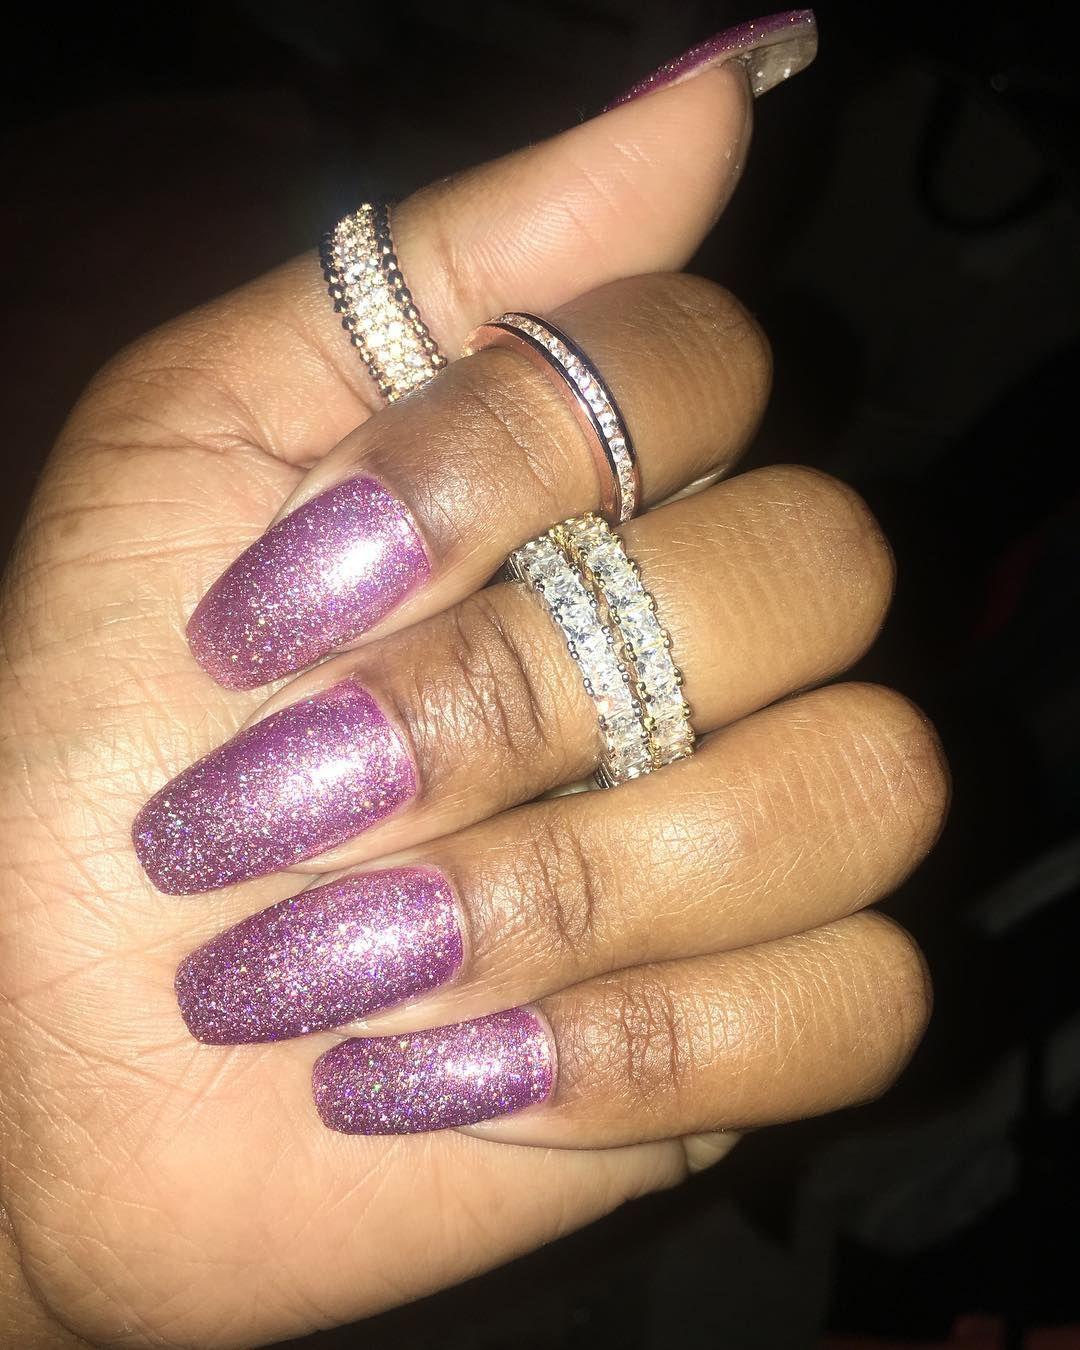 My nails are screaming accessory! #nails #nailart SHOP BClanBeauty ...